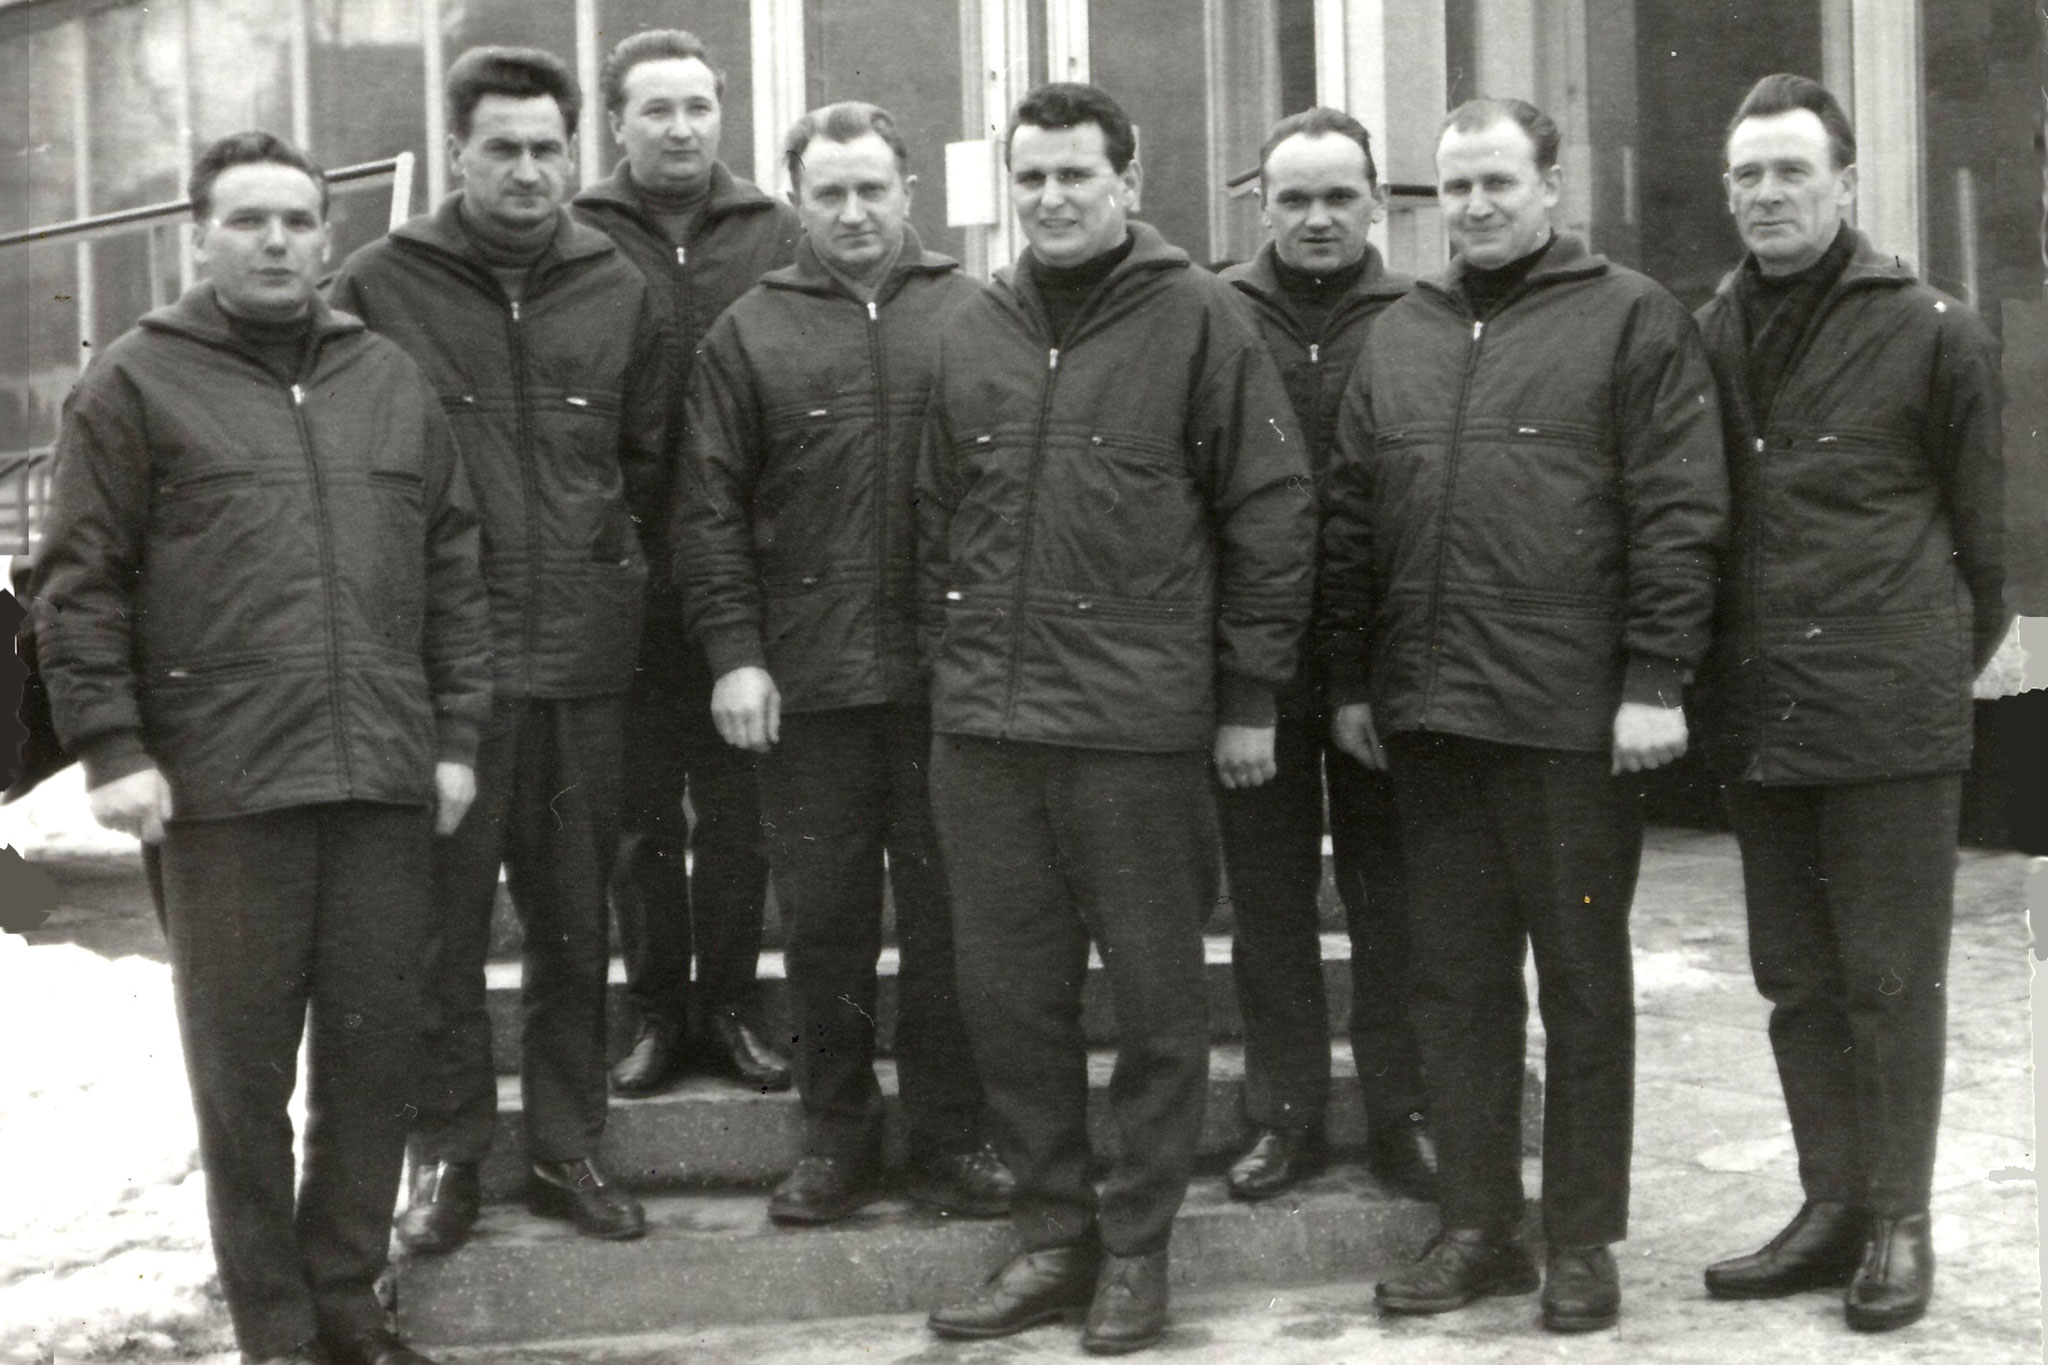 v.l.n.r. Kurt Otto, Günther Rüttinger, Wolfgang Strehlow, Kurt Rüdiger, Günter Bork, Egon Culmbacher, Günter Gries und Paul Thiel (Quelle: AWE Stiftung)